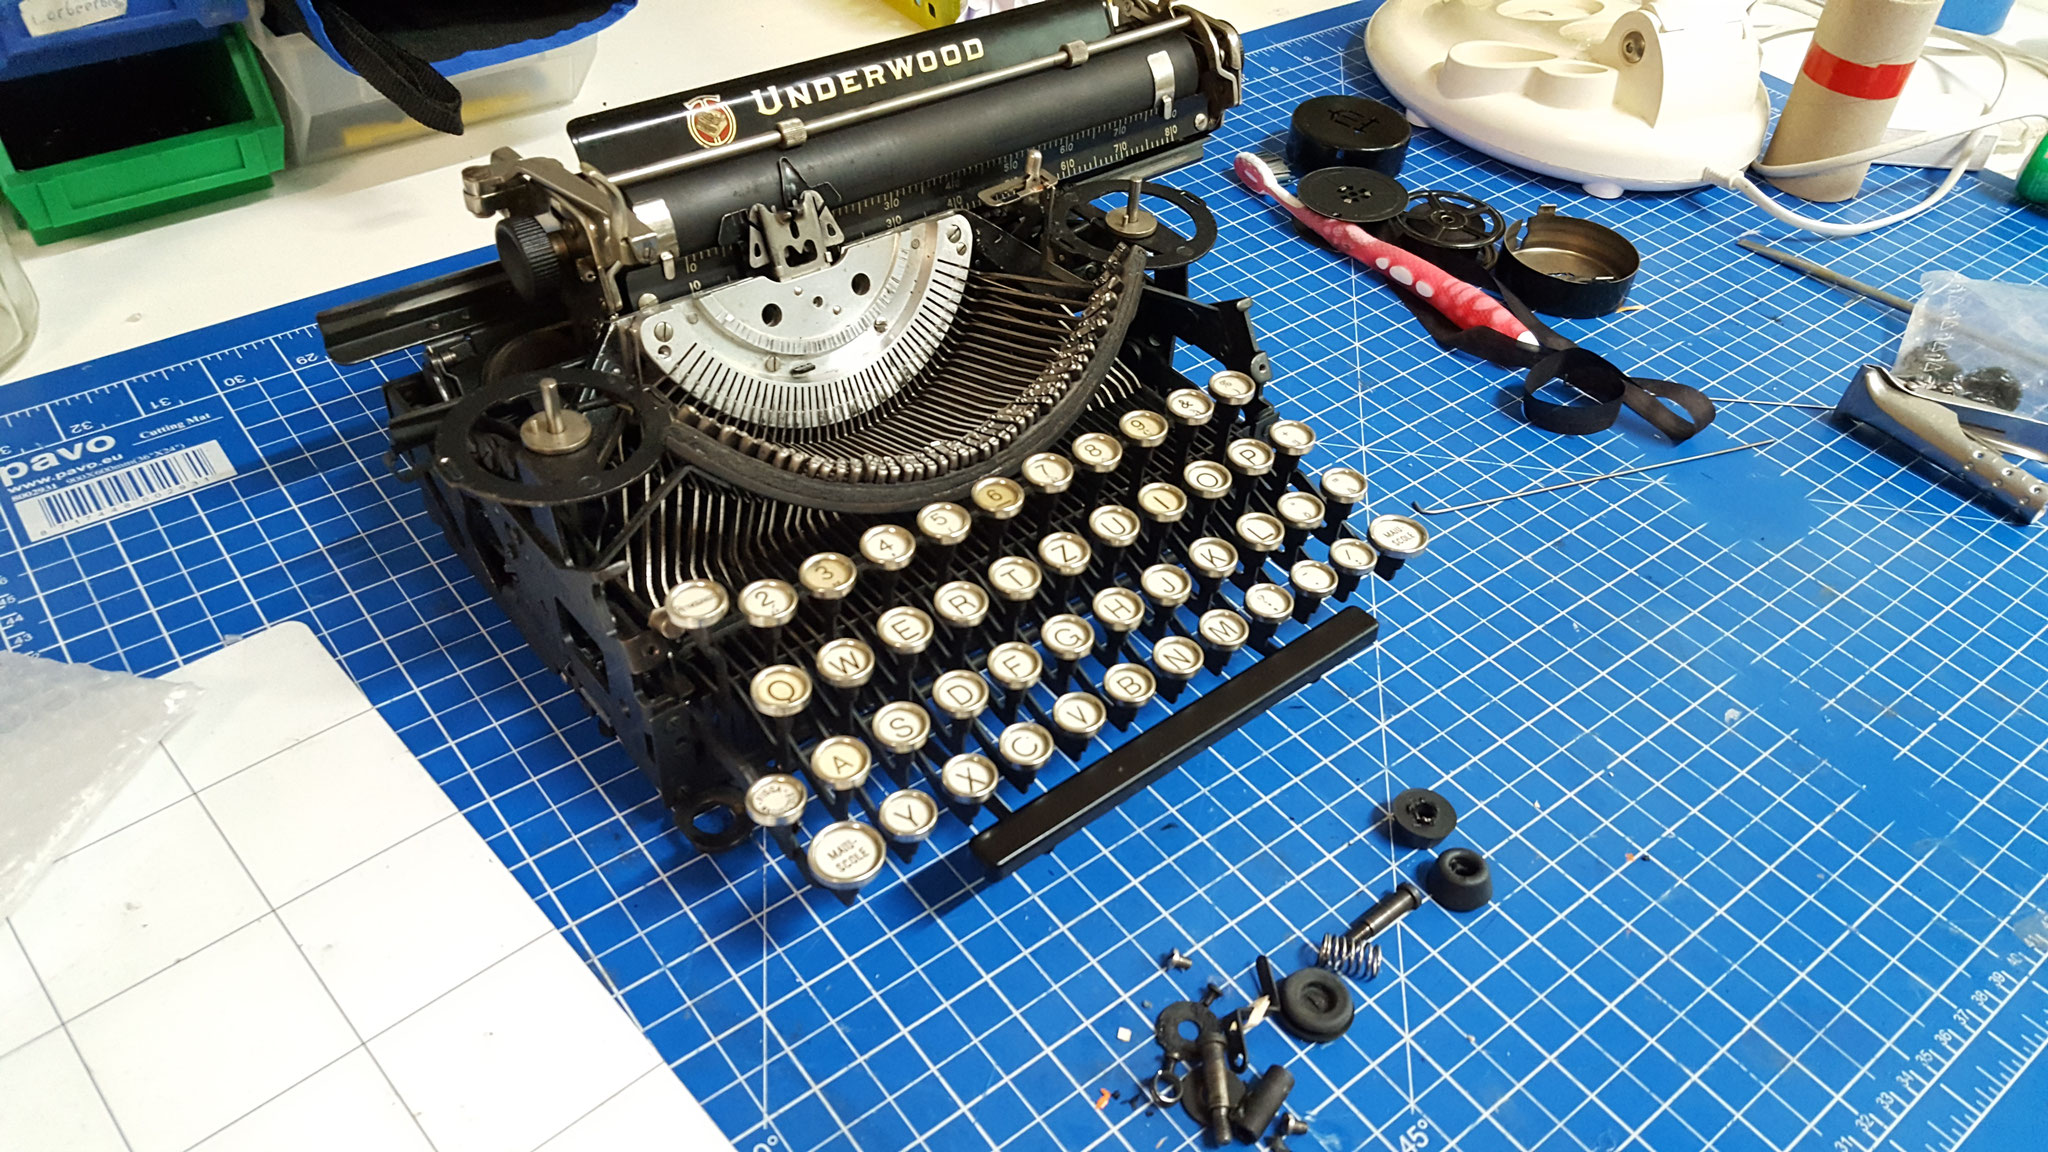 Underwood portable repariert